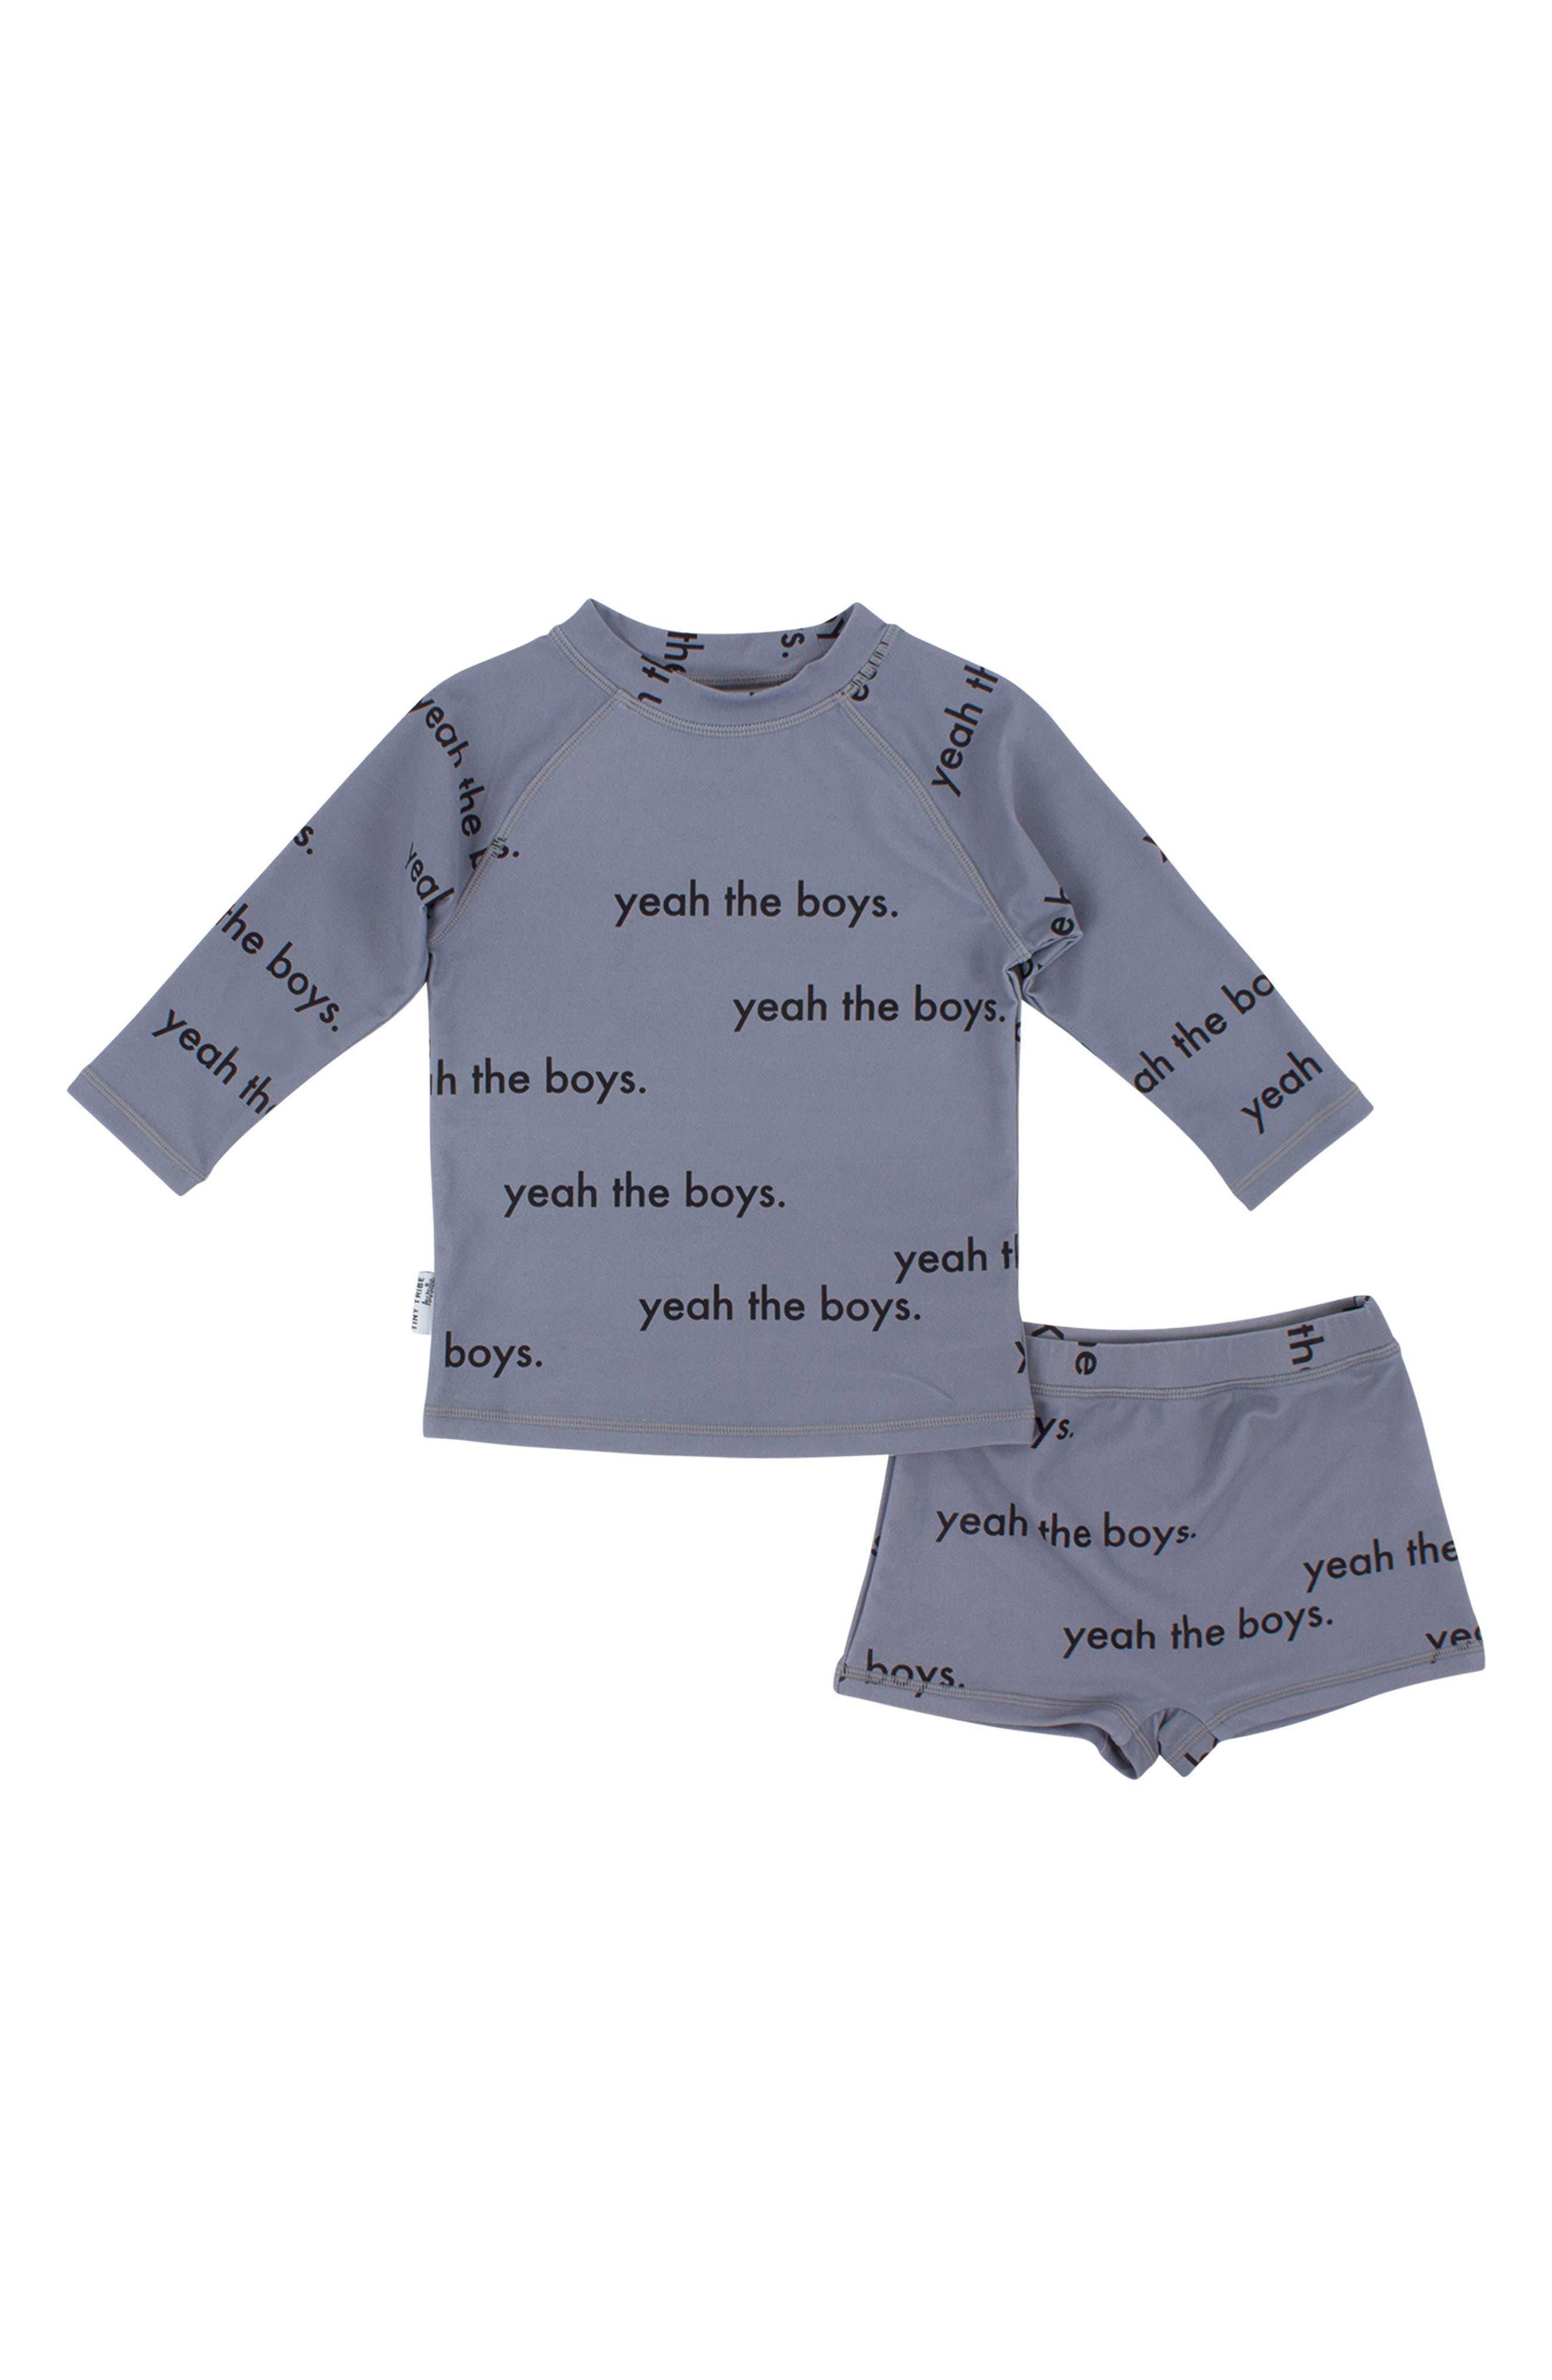 Main Image - Tiny Tribe Yeah the Boys Rashguard & Shorts Set (Toddler Boys & Little Boys)